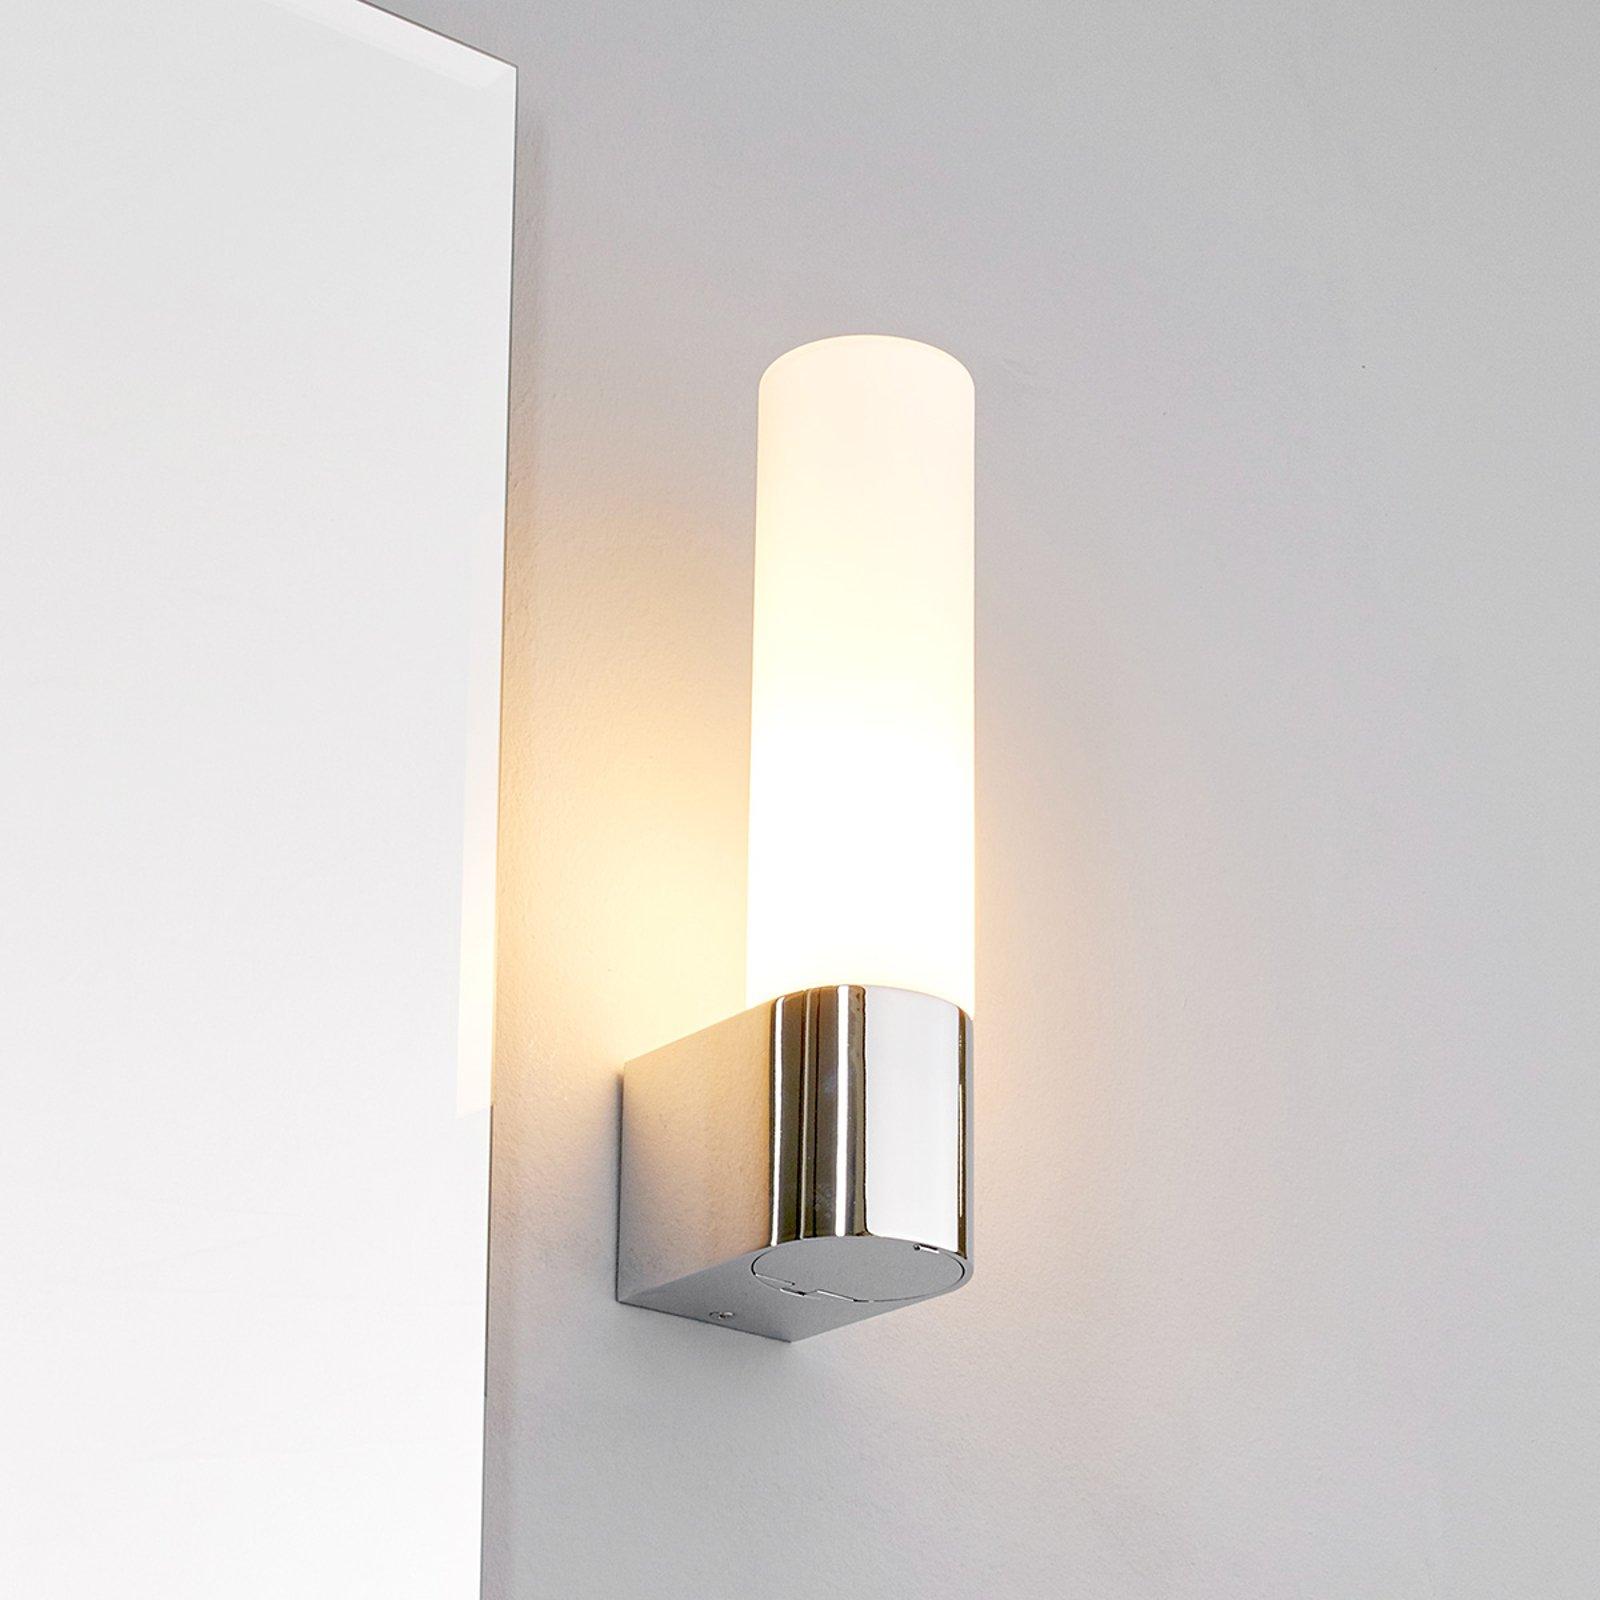 Praktisk speillampe Melike med strømuttak